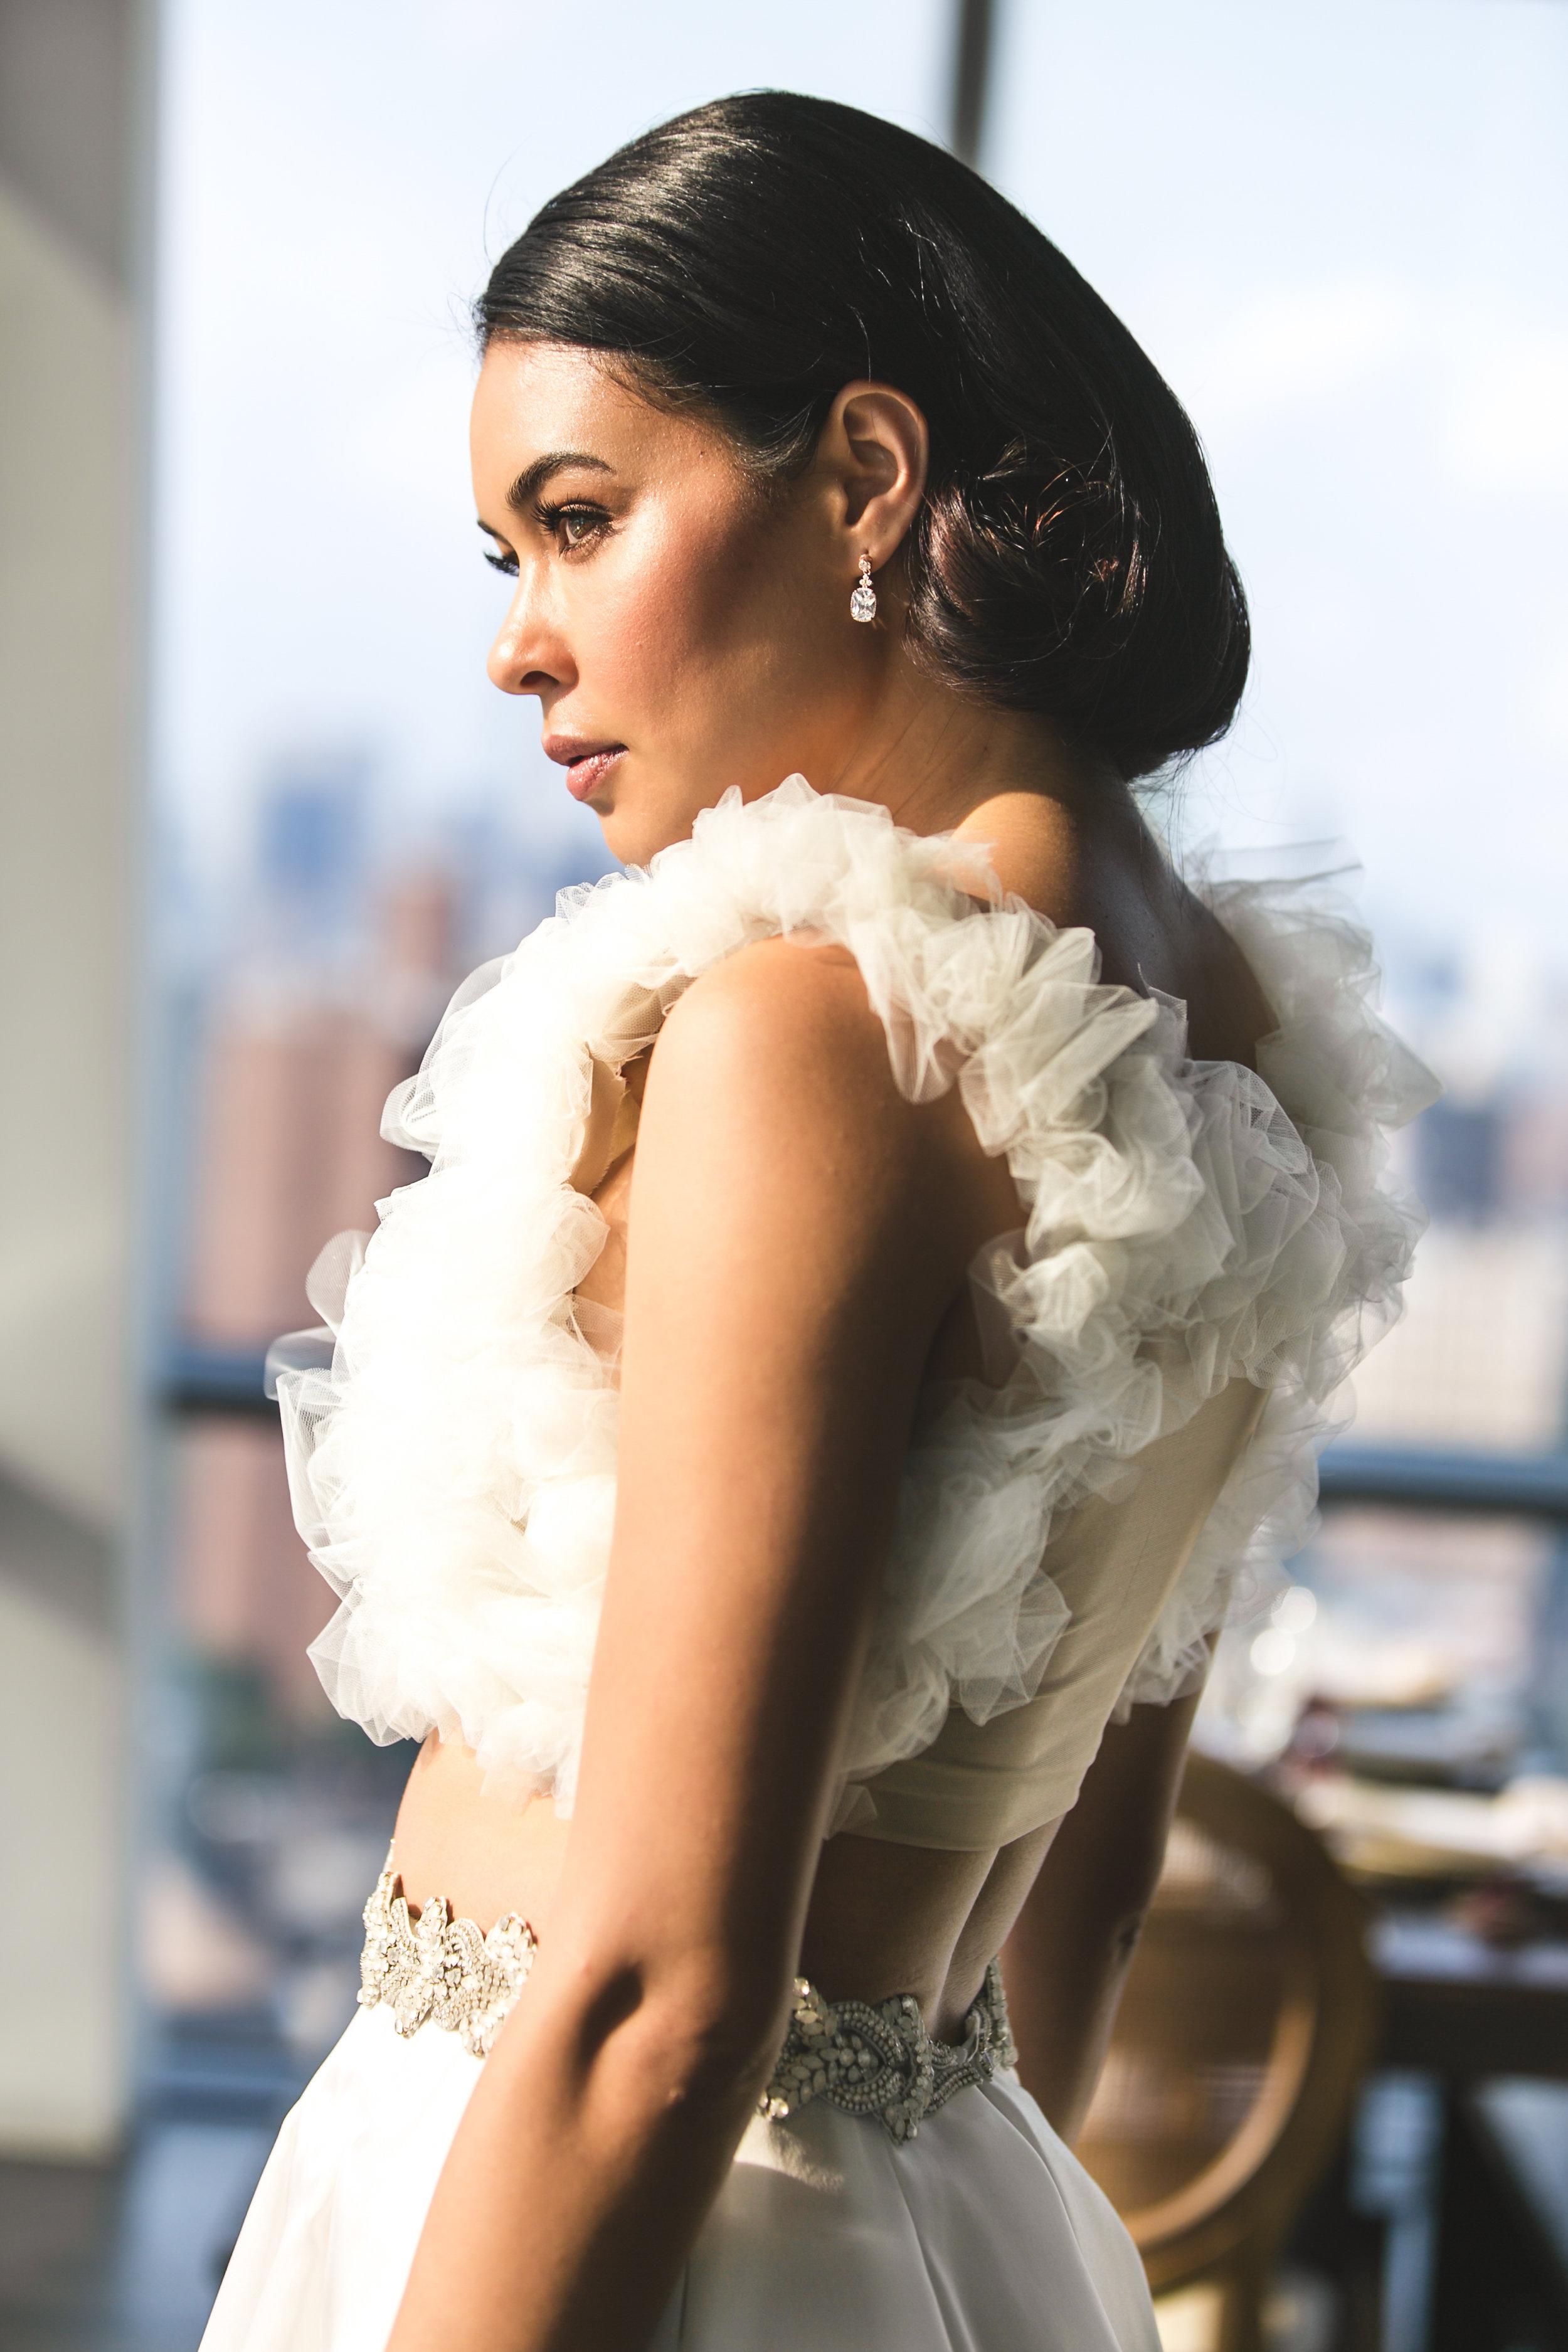 Nathalie Kraynina BrideBond_Girl_Bride_GinaEsposito-67.jpg